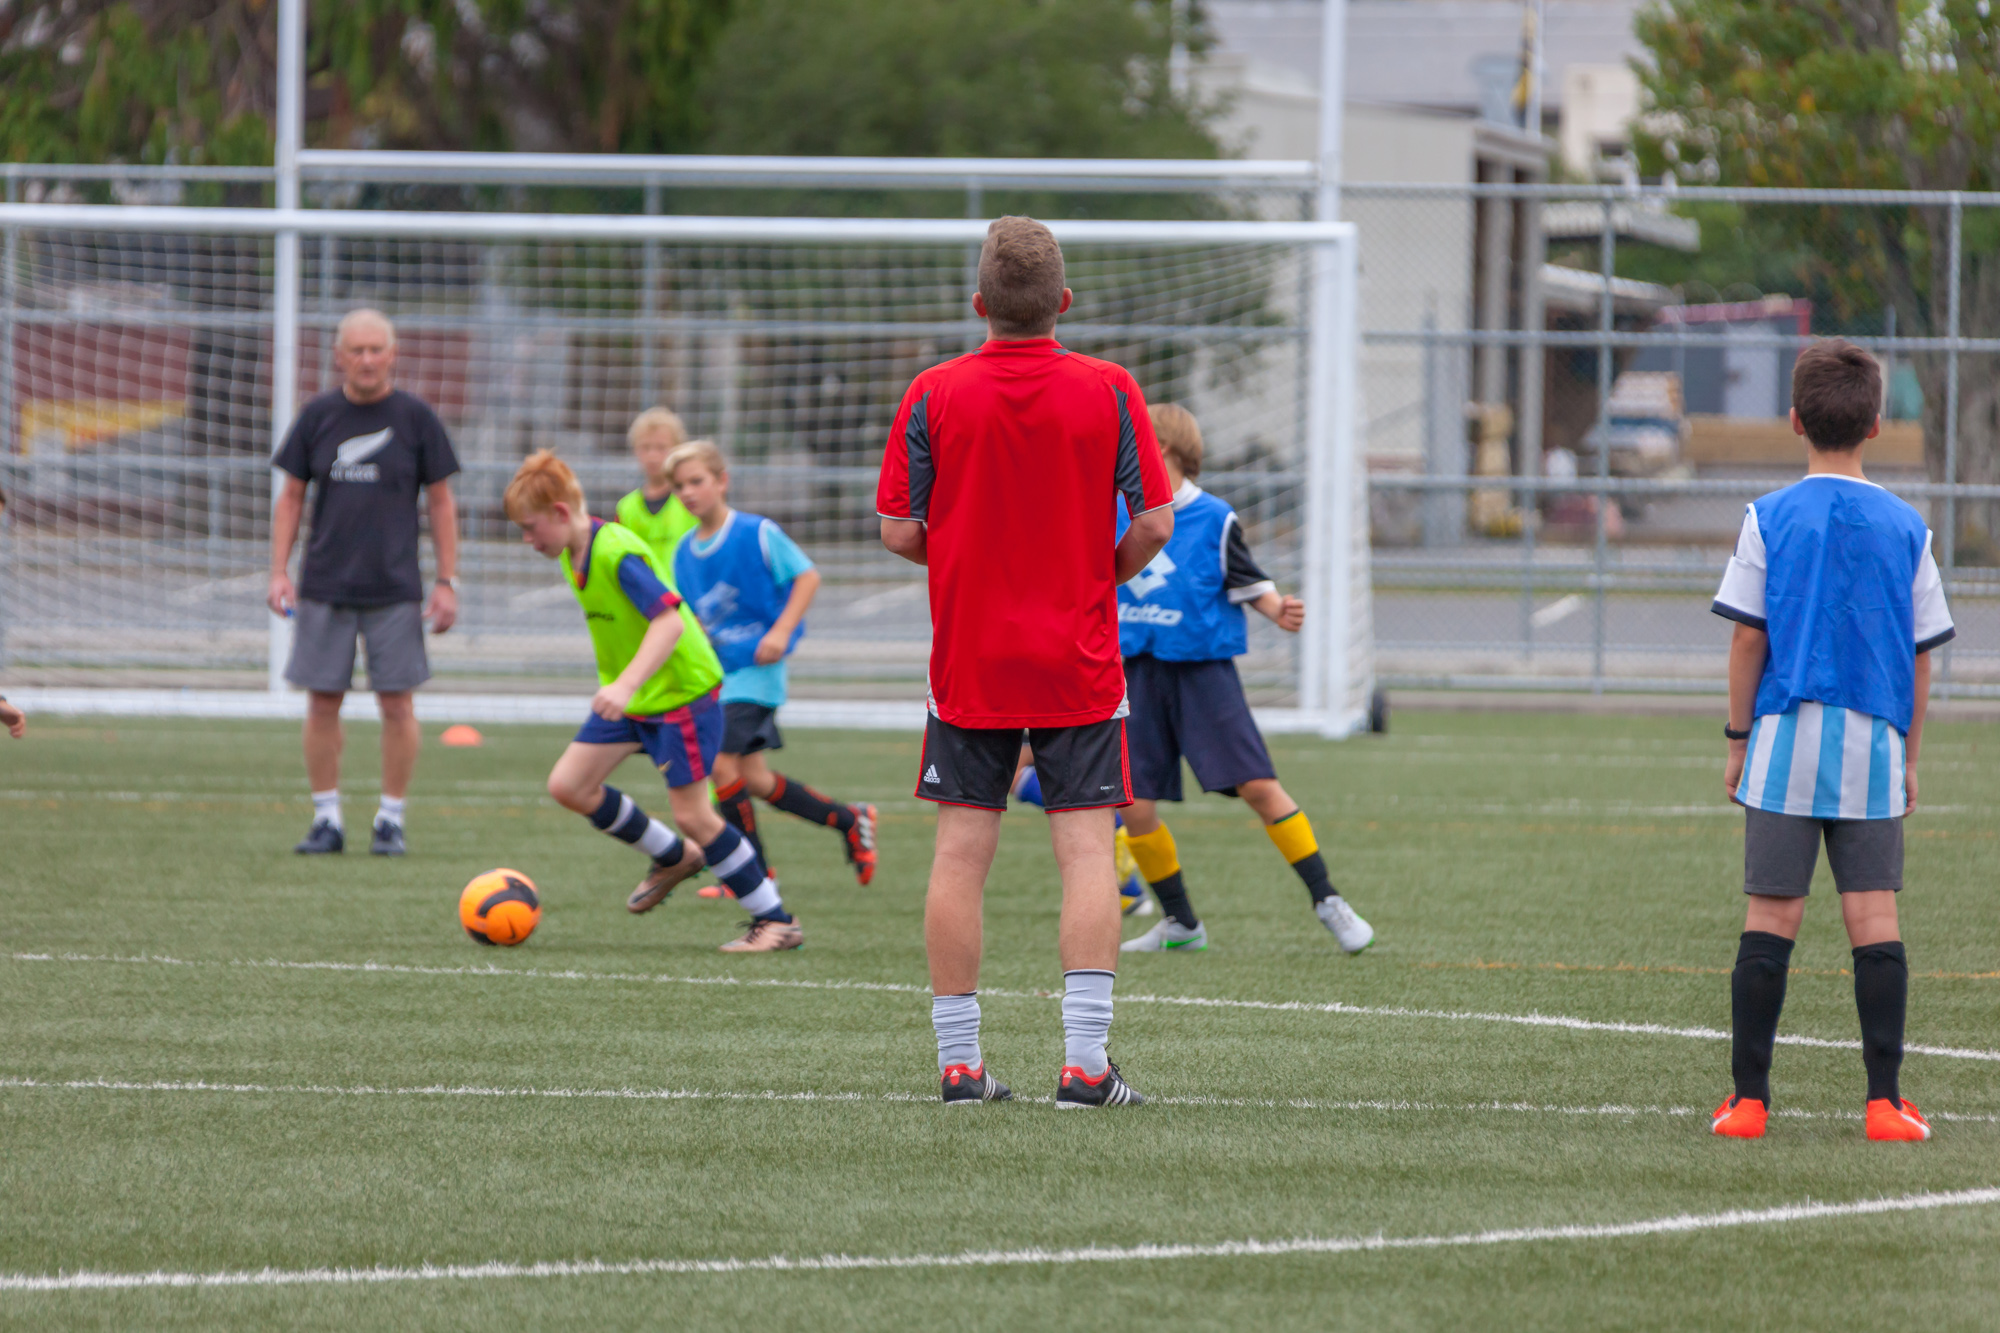 UHCC Soccer Coach 4428